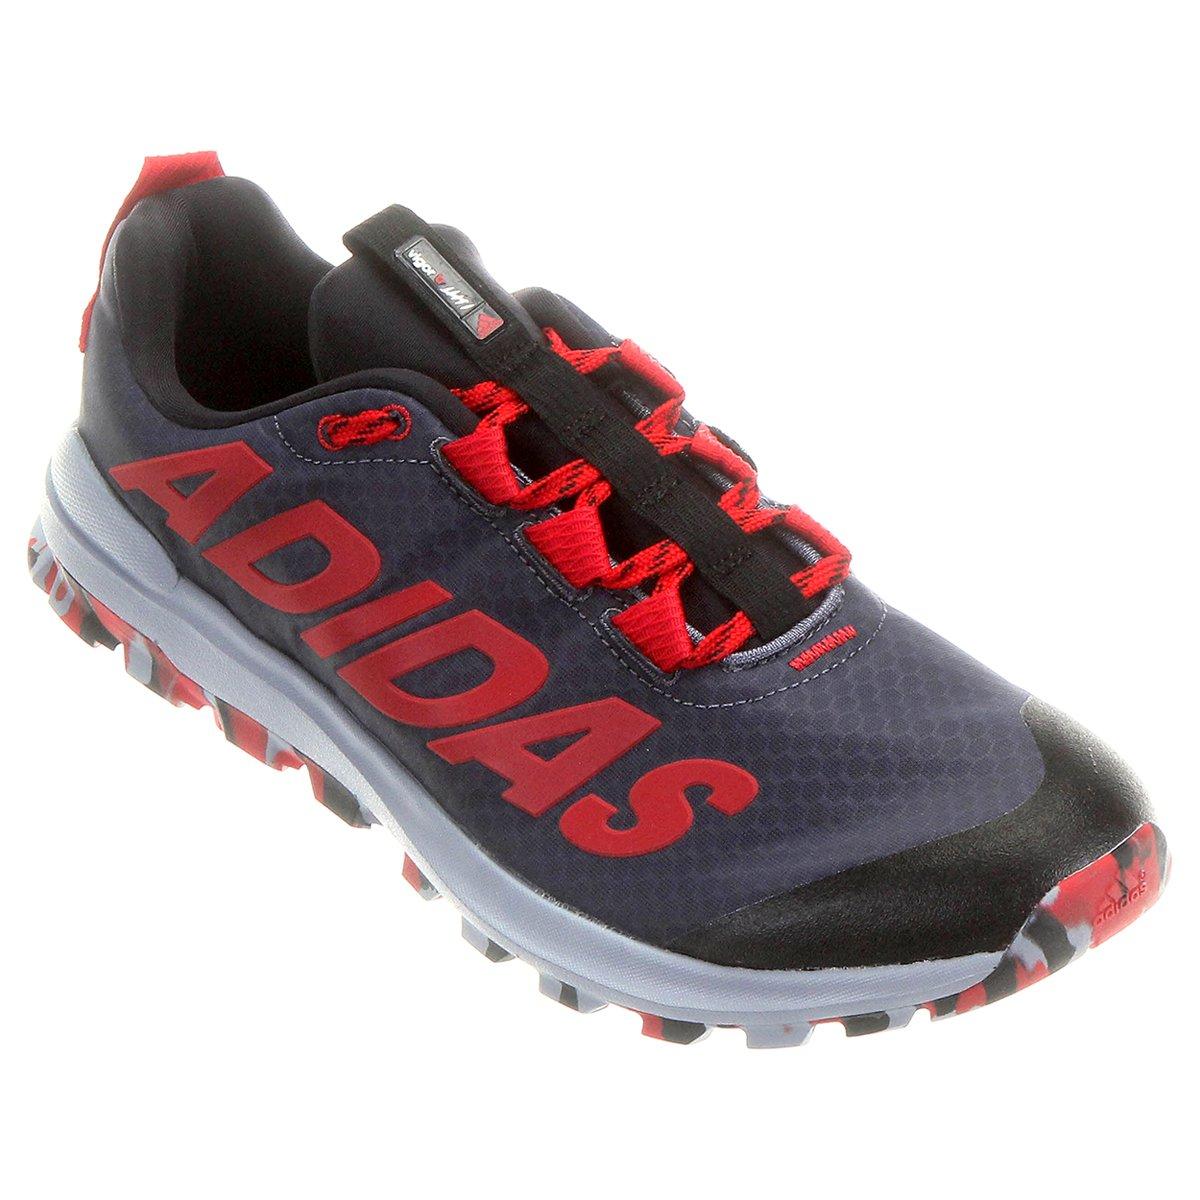 ba4f5a07eeb Tênis Adidas Vigor 6 TR - Compre Agora